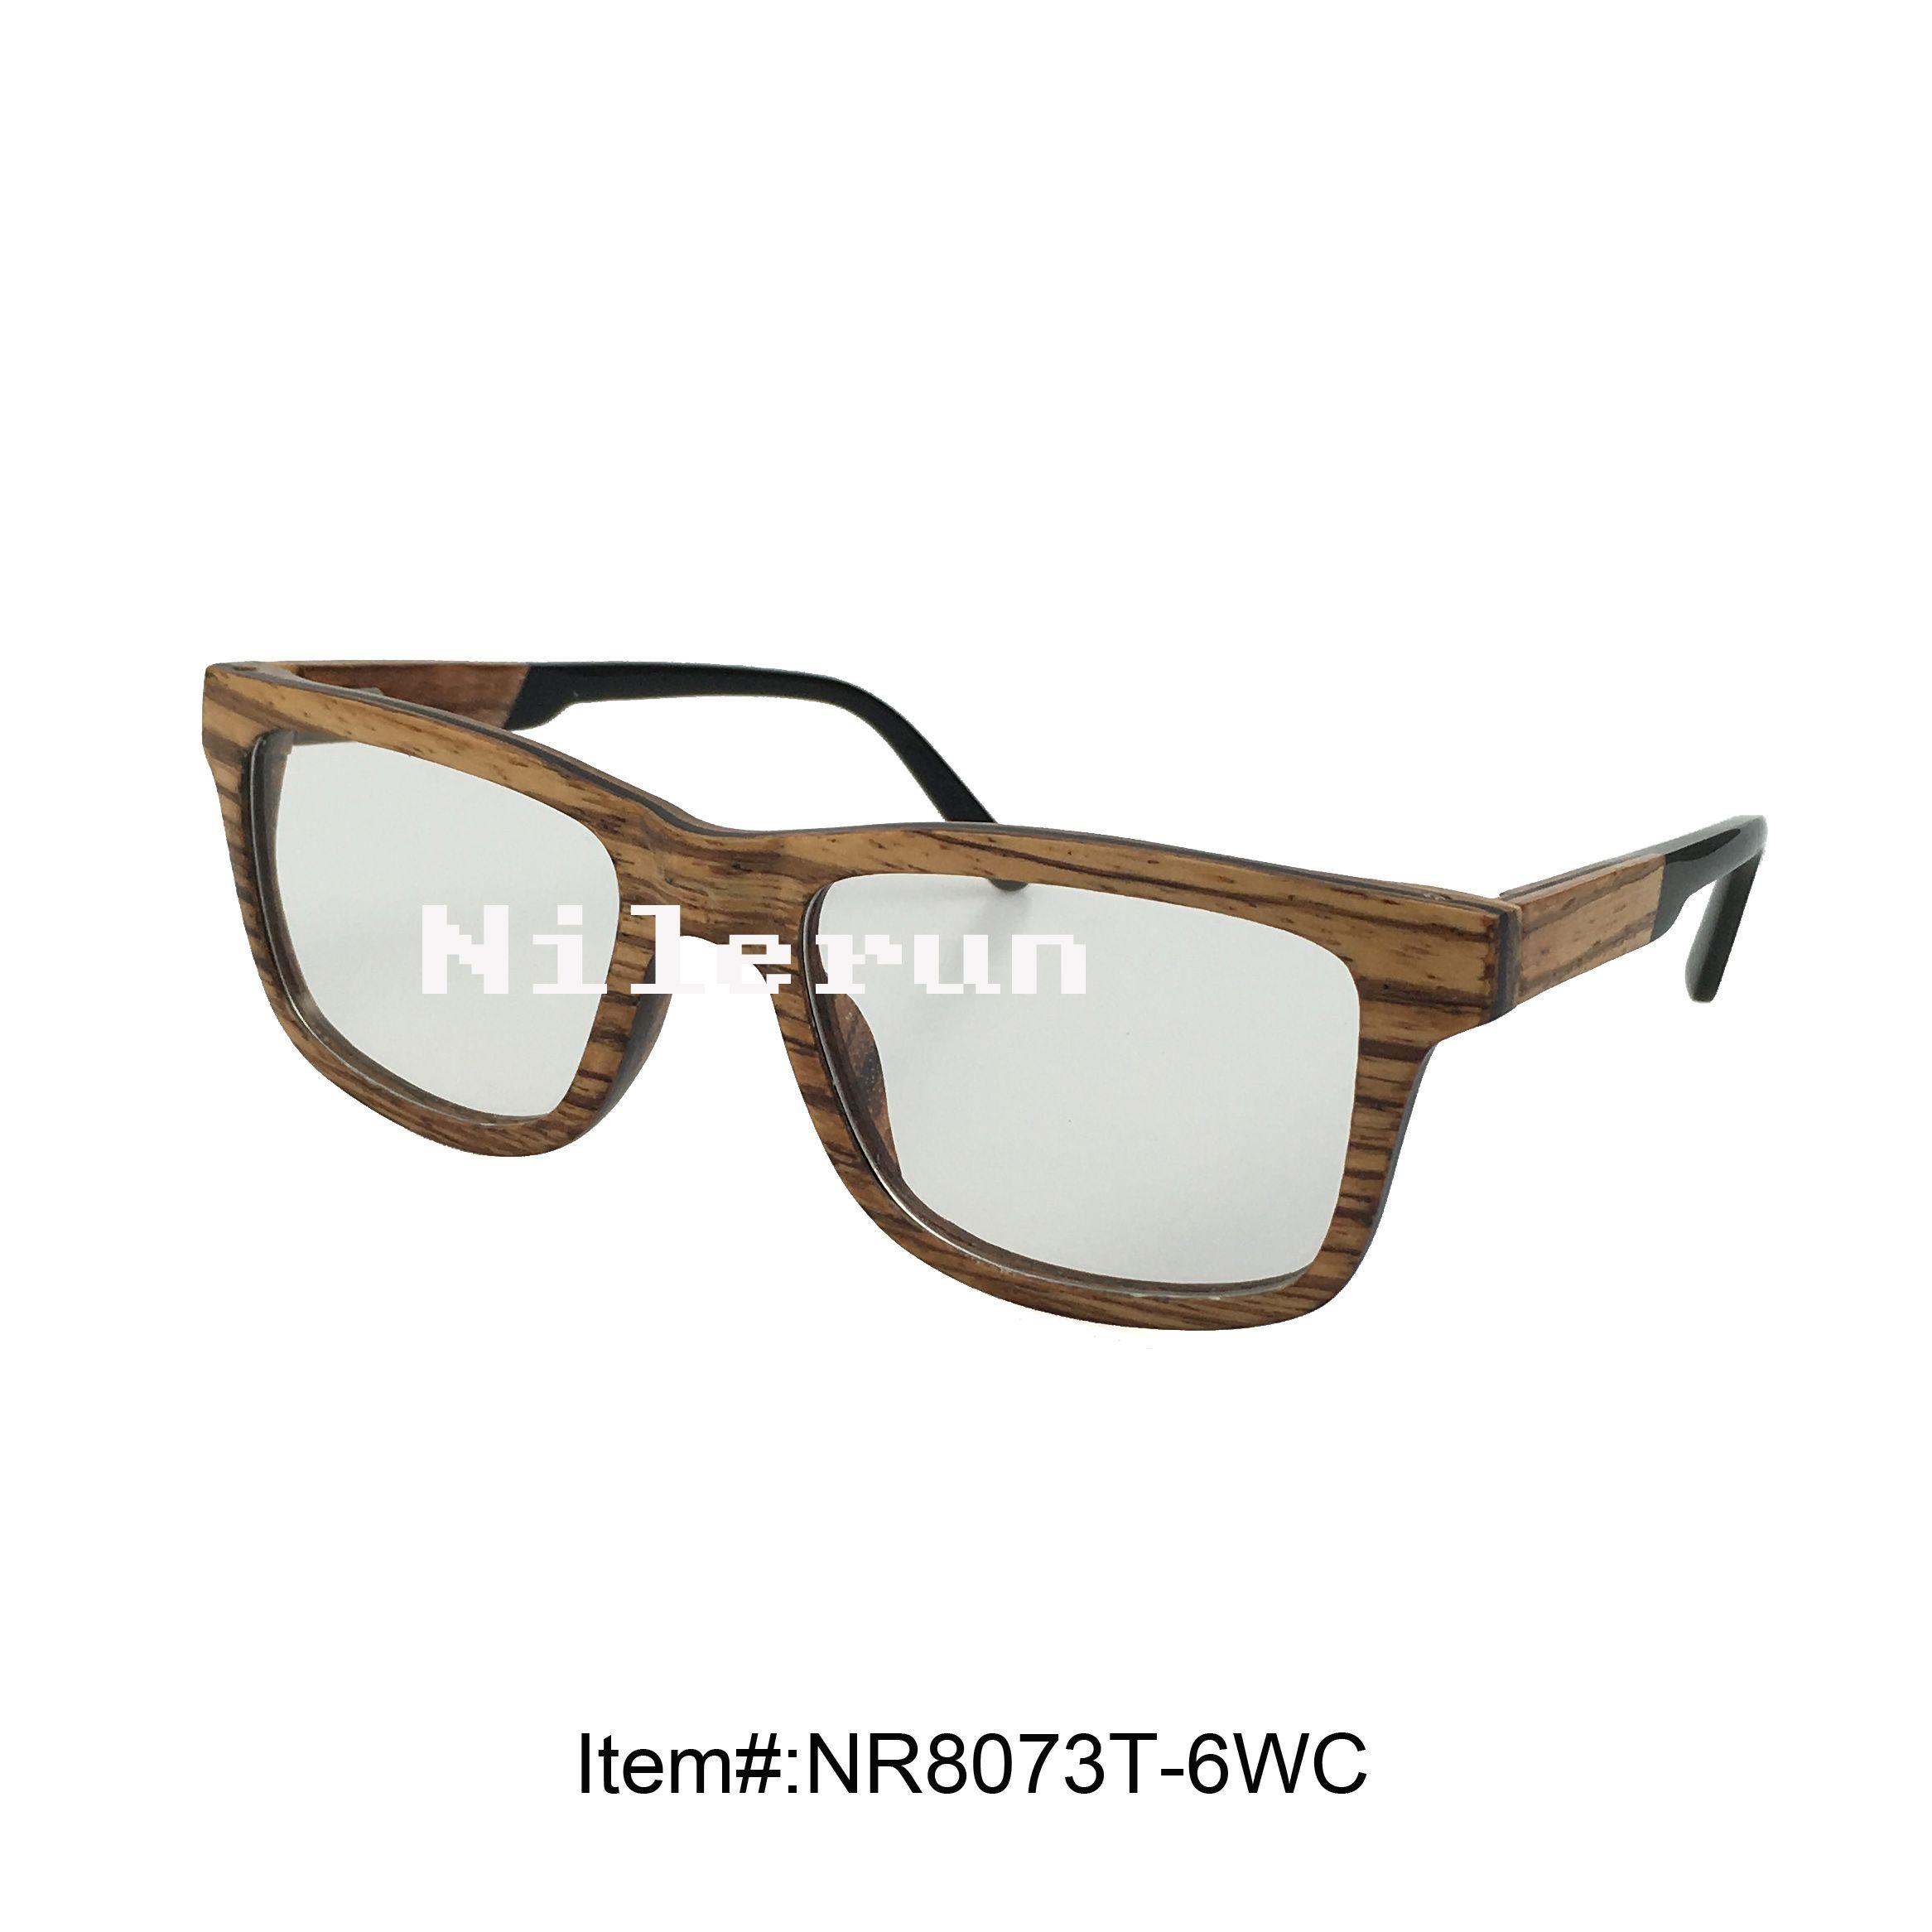 423469d323 Compre Gafas Ópticas De Marco De Madera De Cebra Hechas A Mano De Moda A  $21.32 Del Nilerun | DHgate.Com